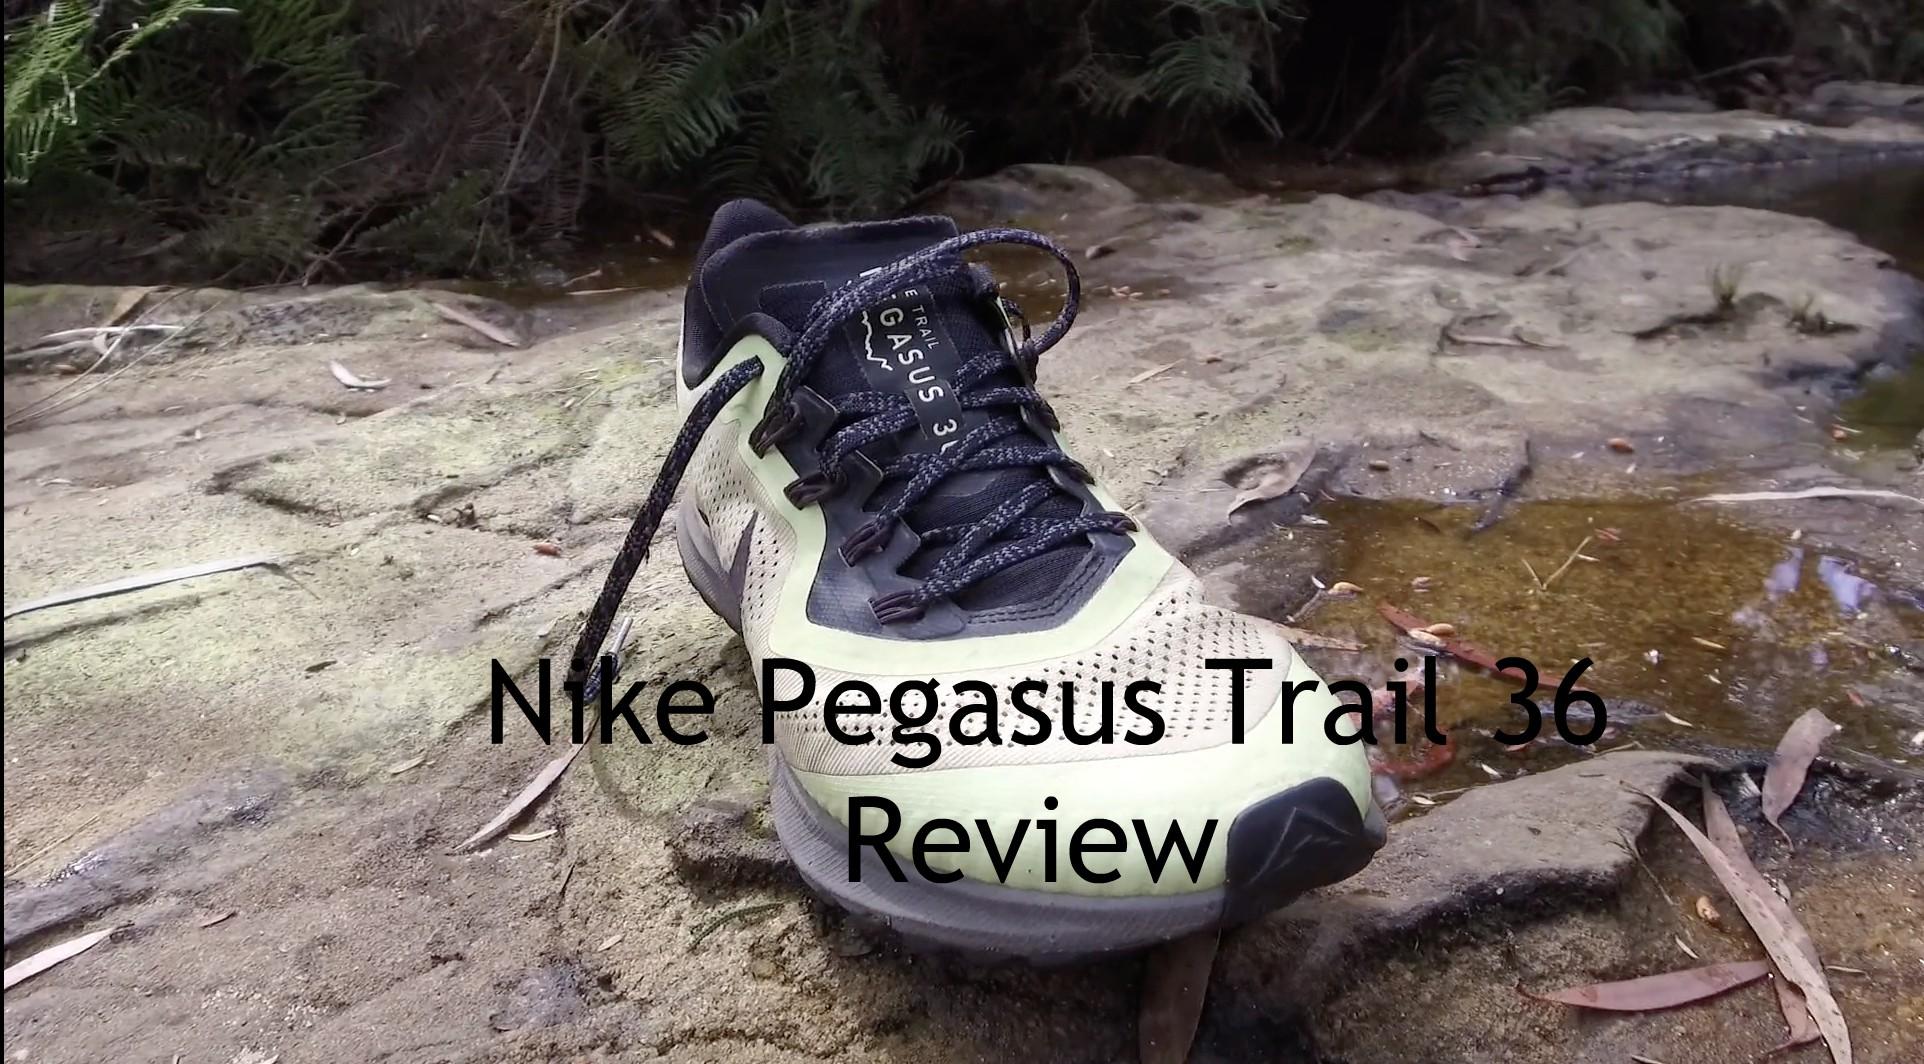 Nike Pegasus 36 Trail - Review